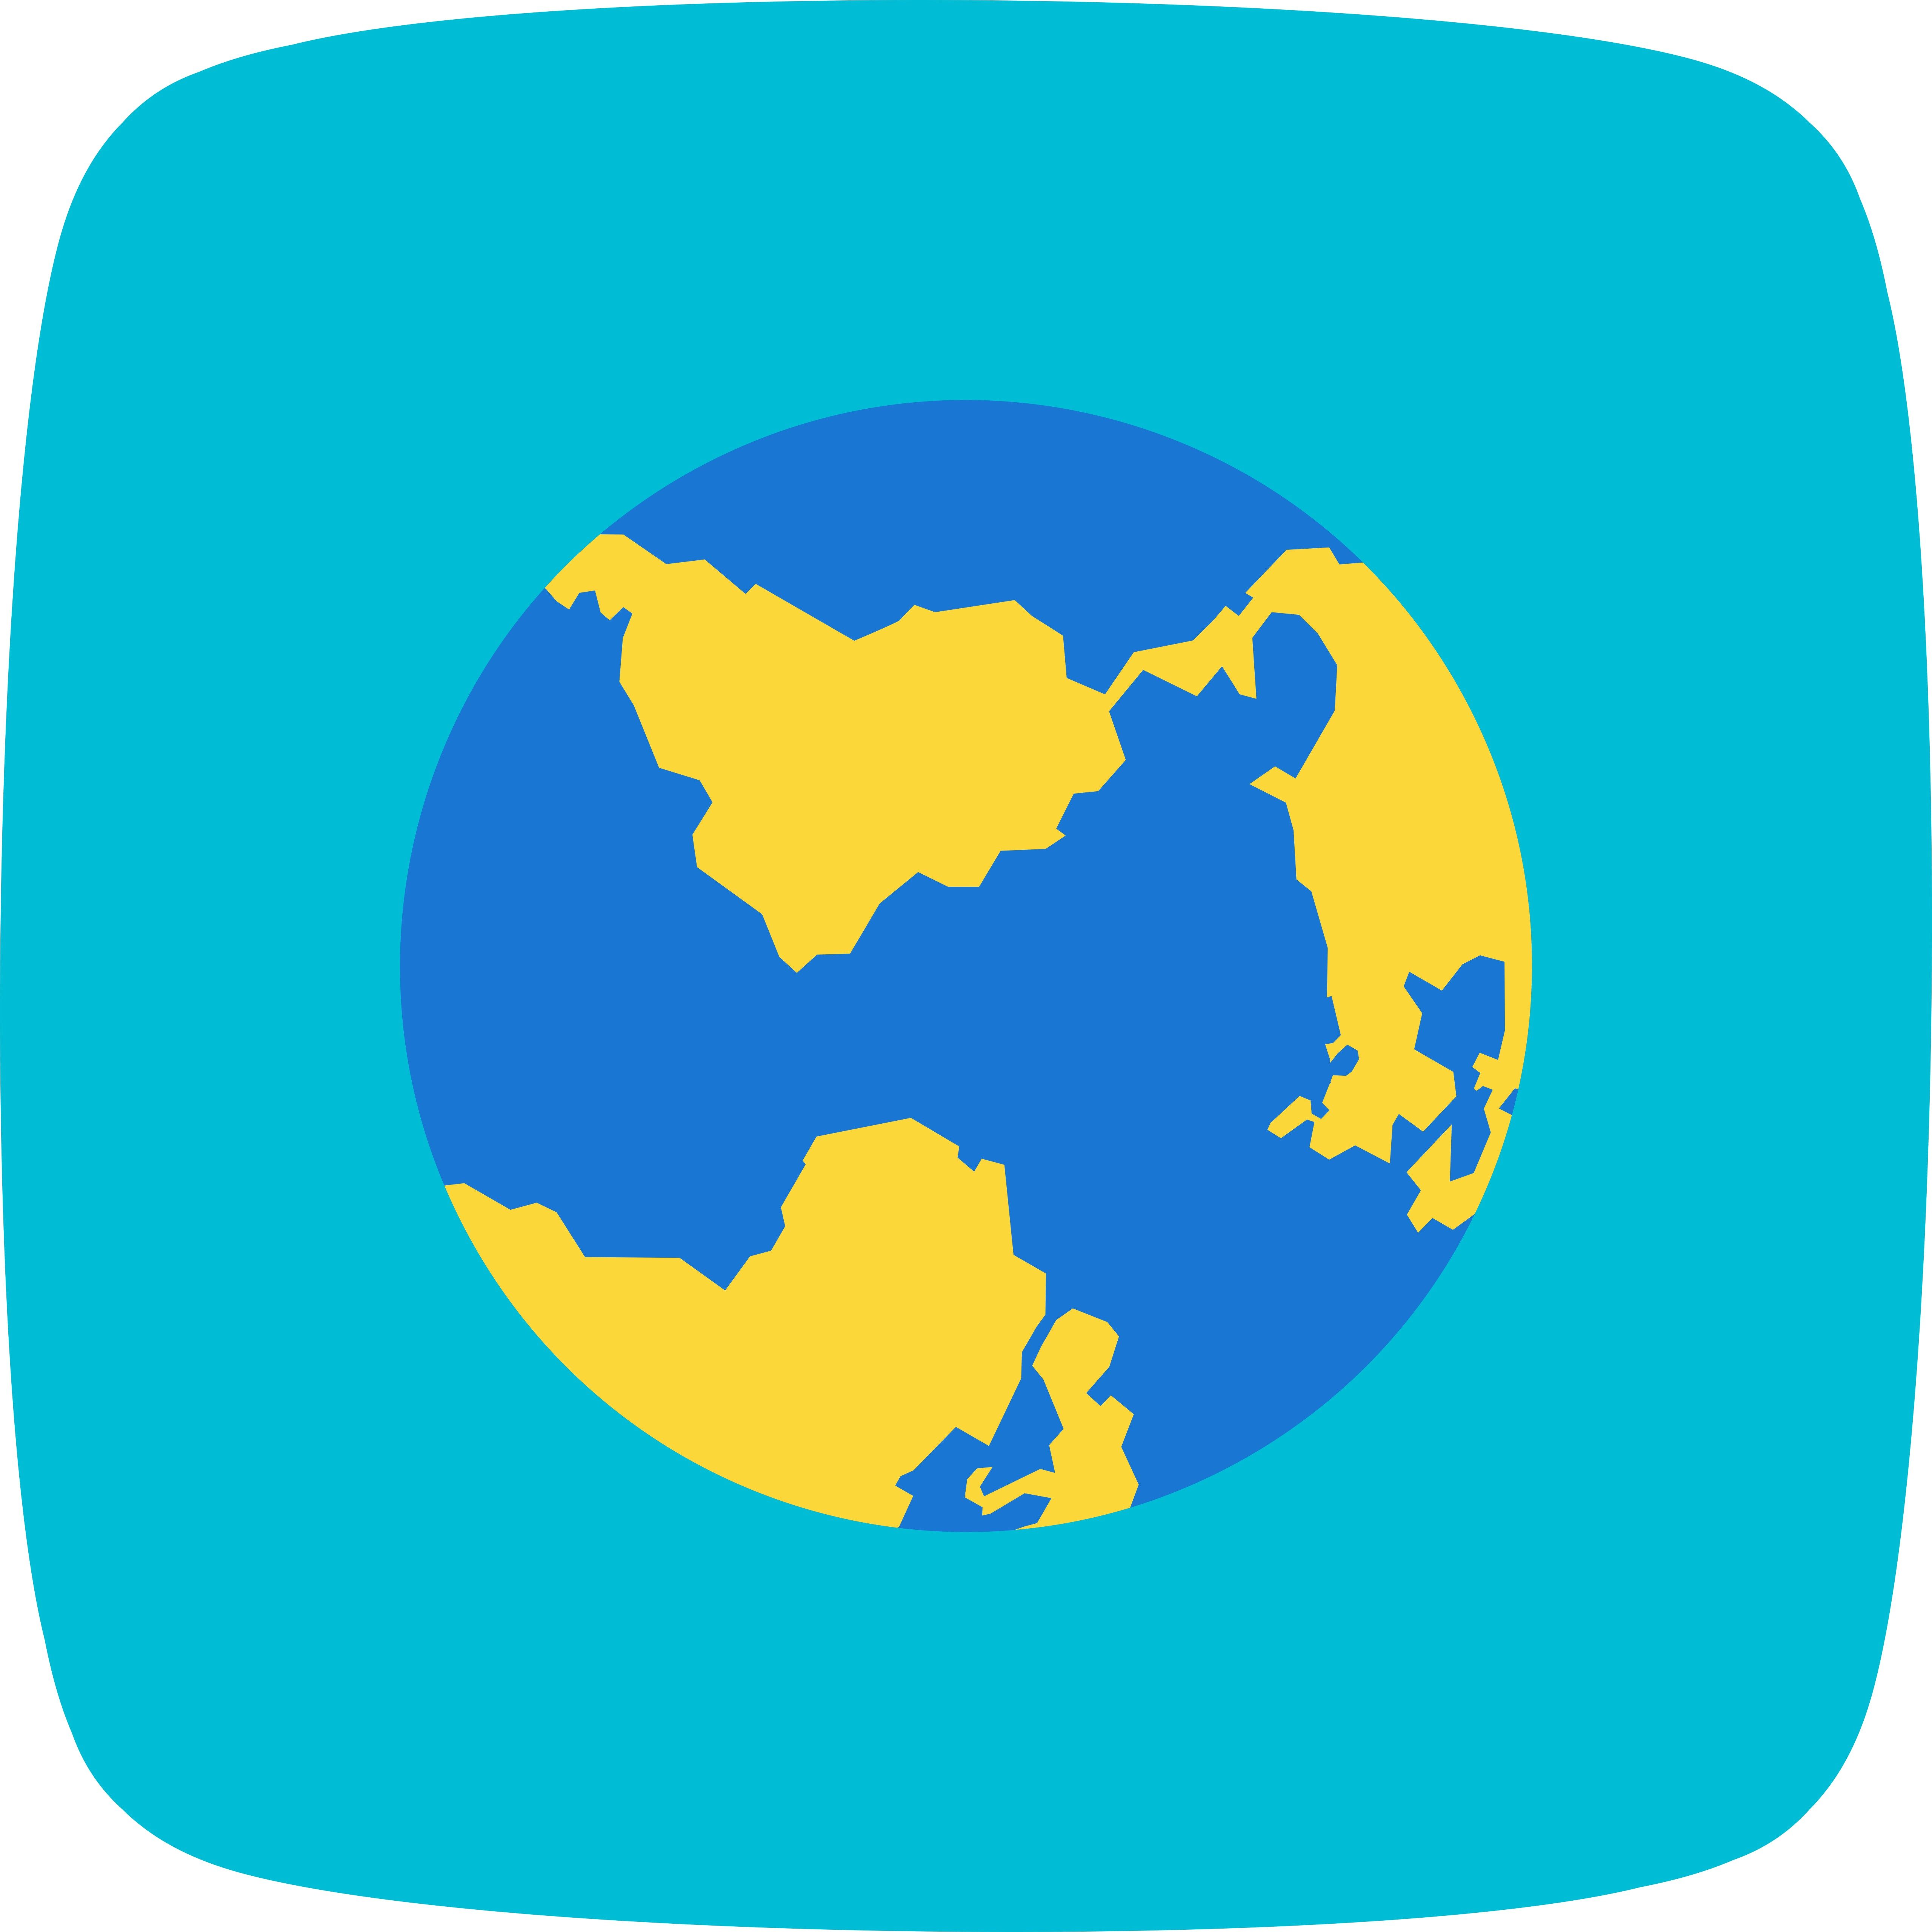 Earth Vector Icon 450151 - Download Free Vectors, Clipart ...